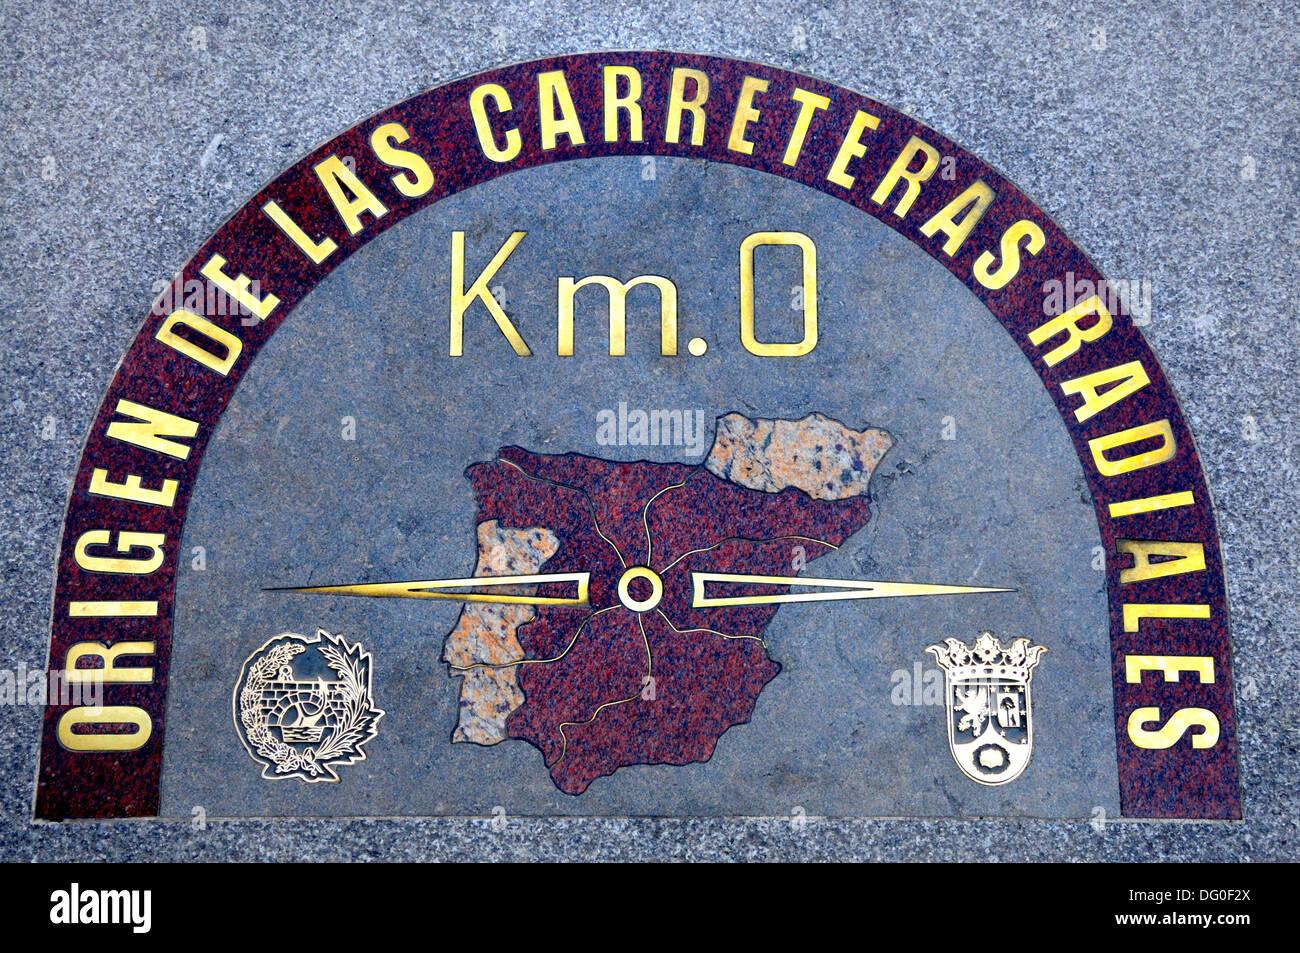 Madrid spain puerta del sol 39 kilometro cero 39 paving for Kilometro 0 puerta del sol